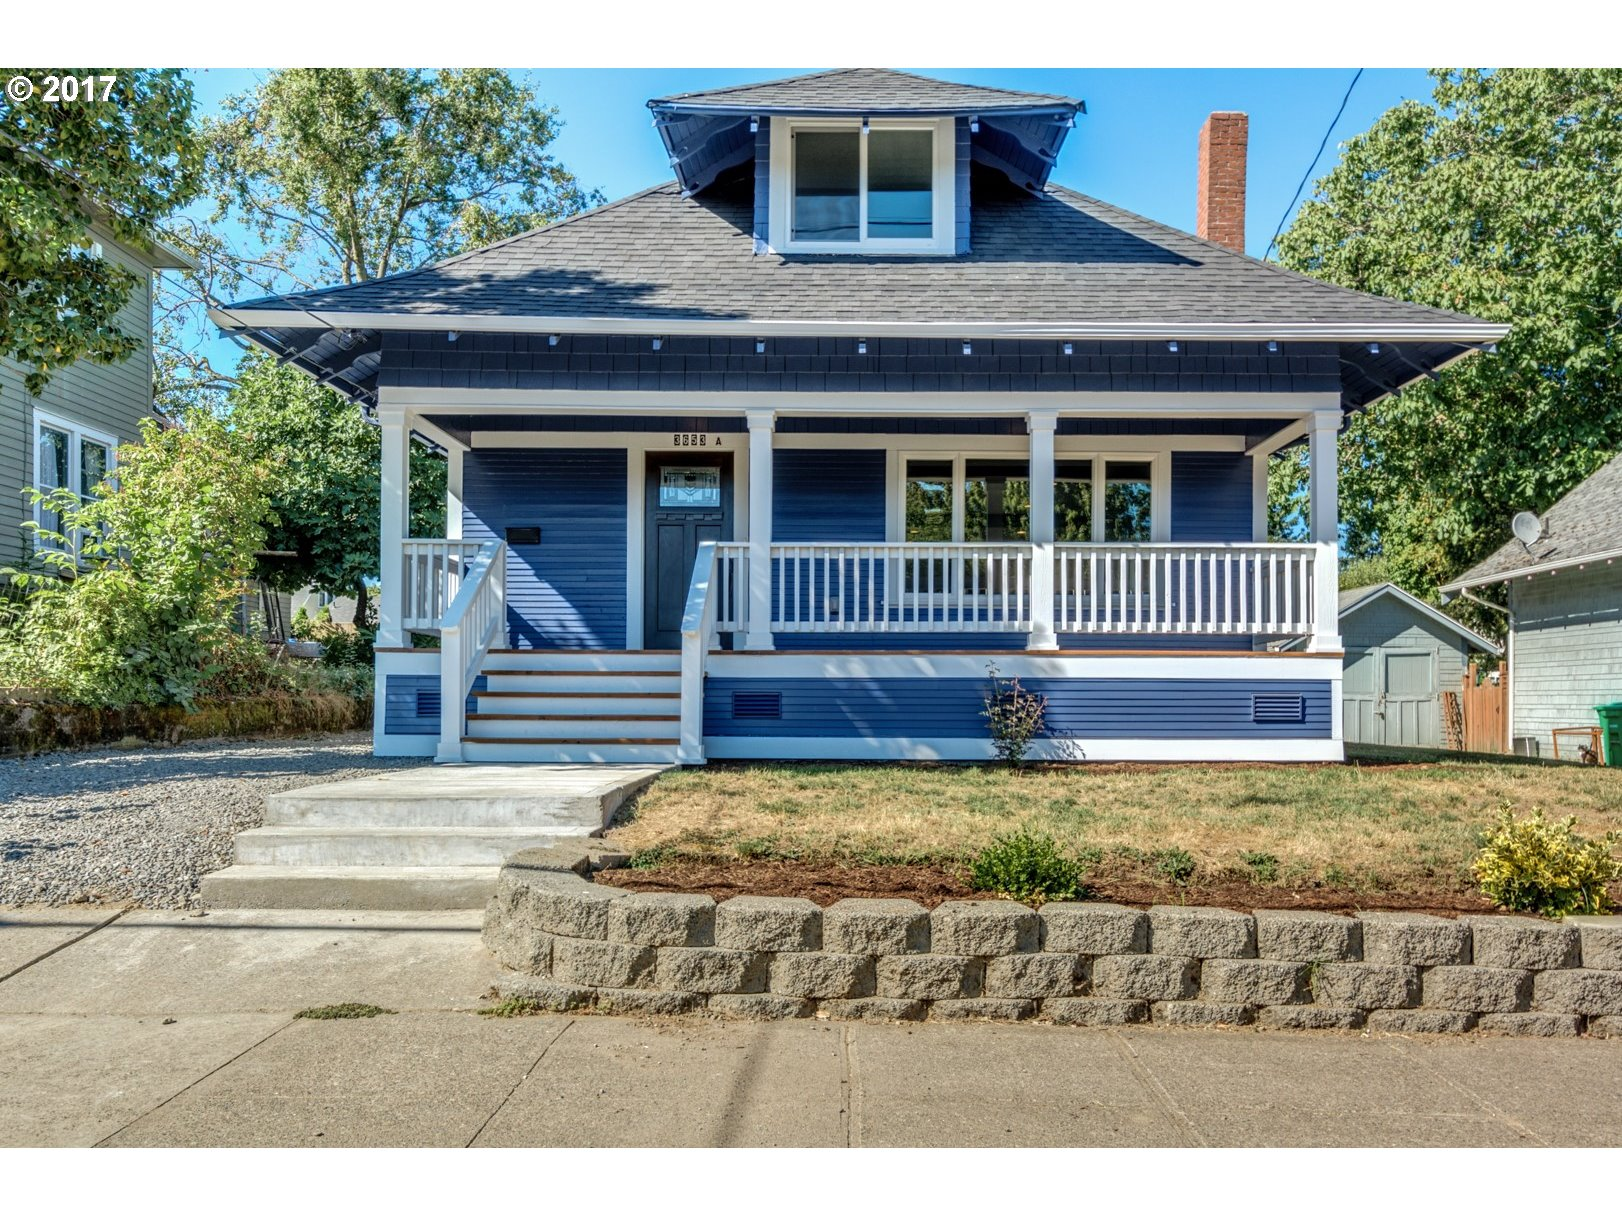 3653 SE GLADSTONE ST, Portland OR 97202